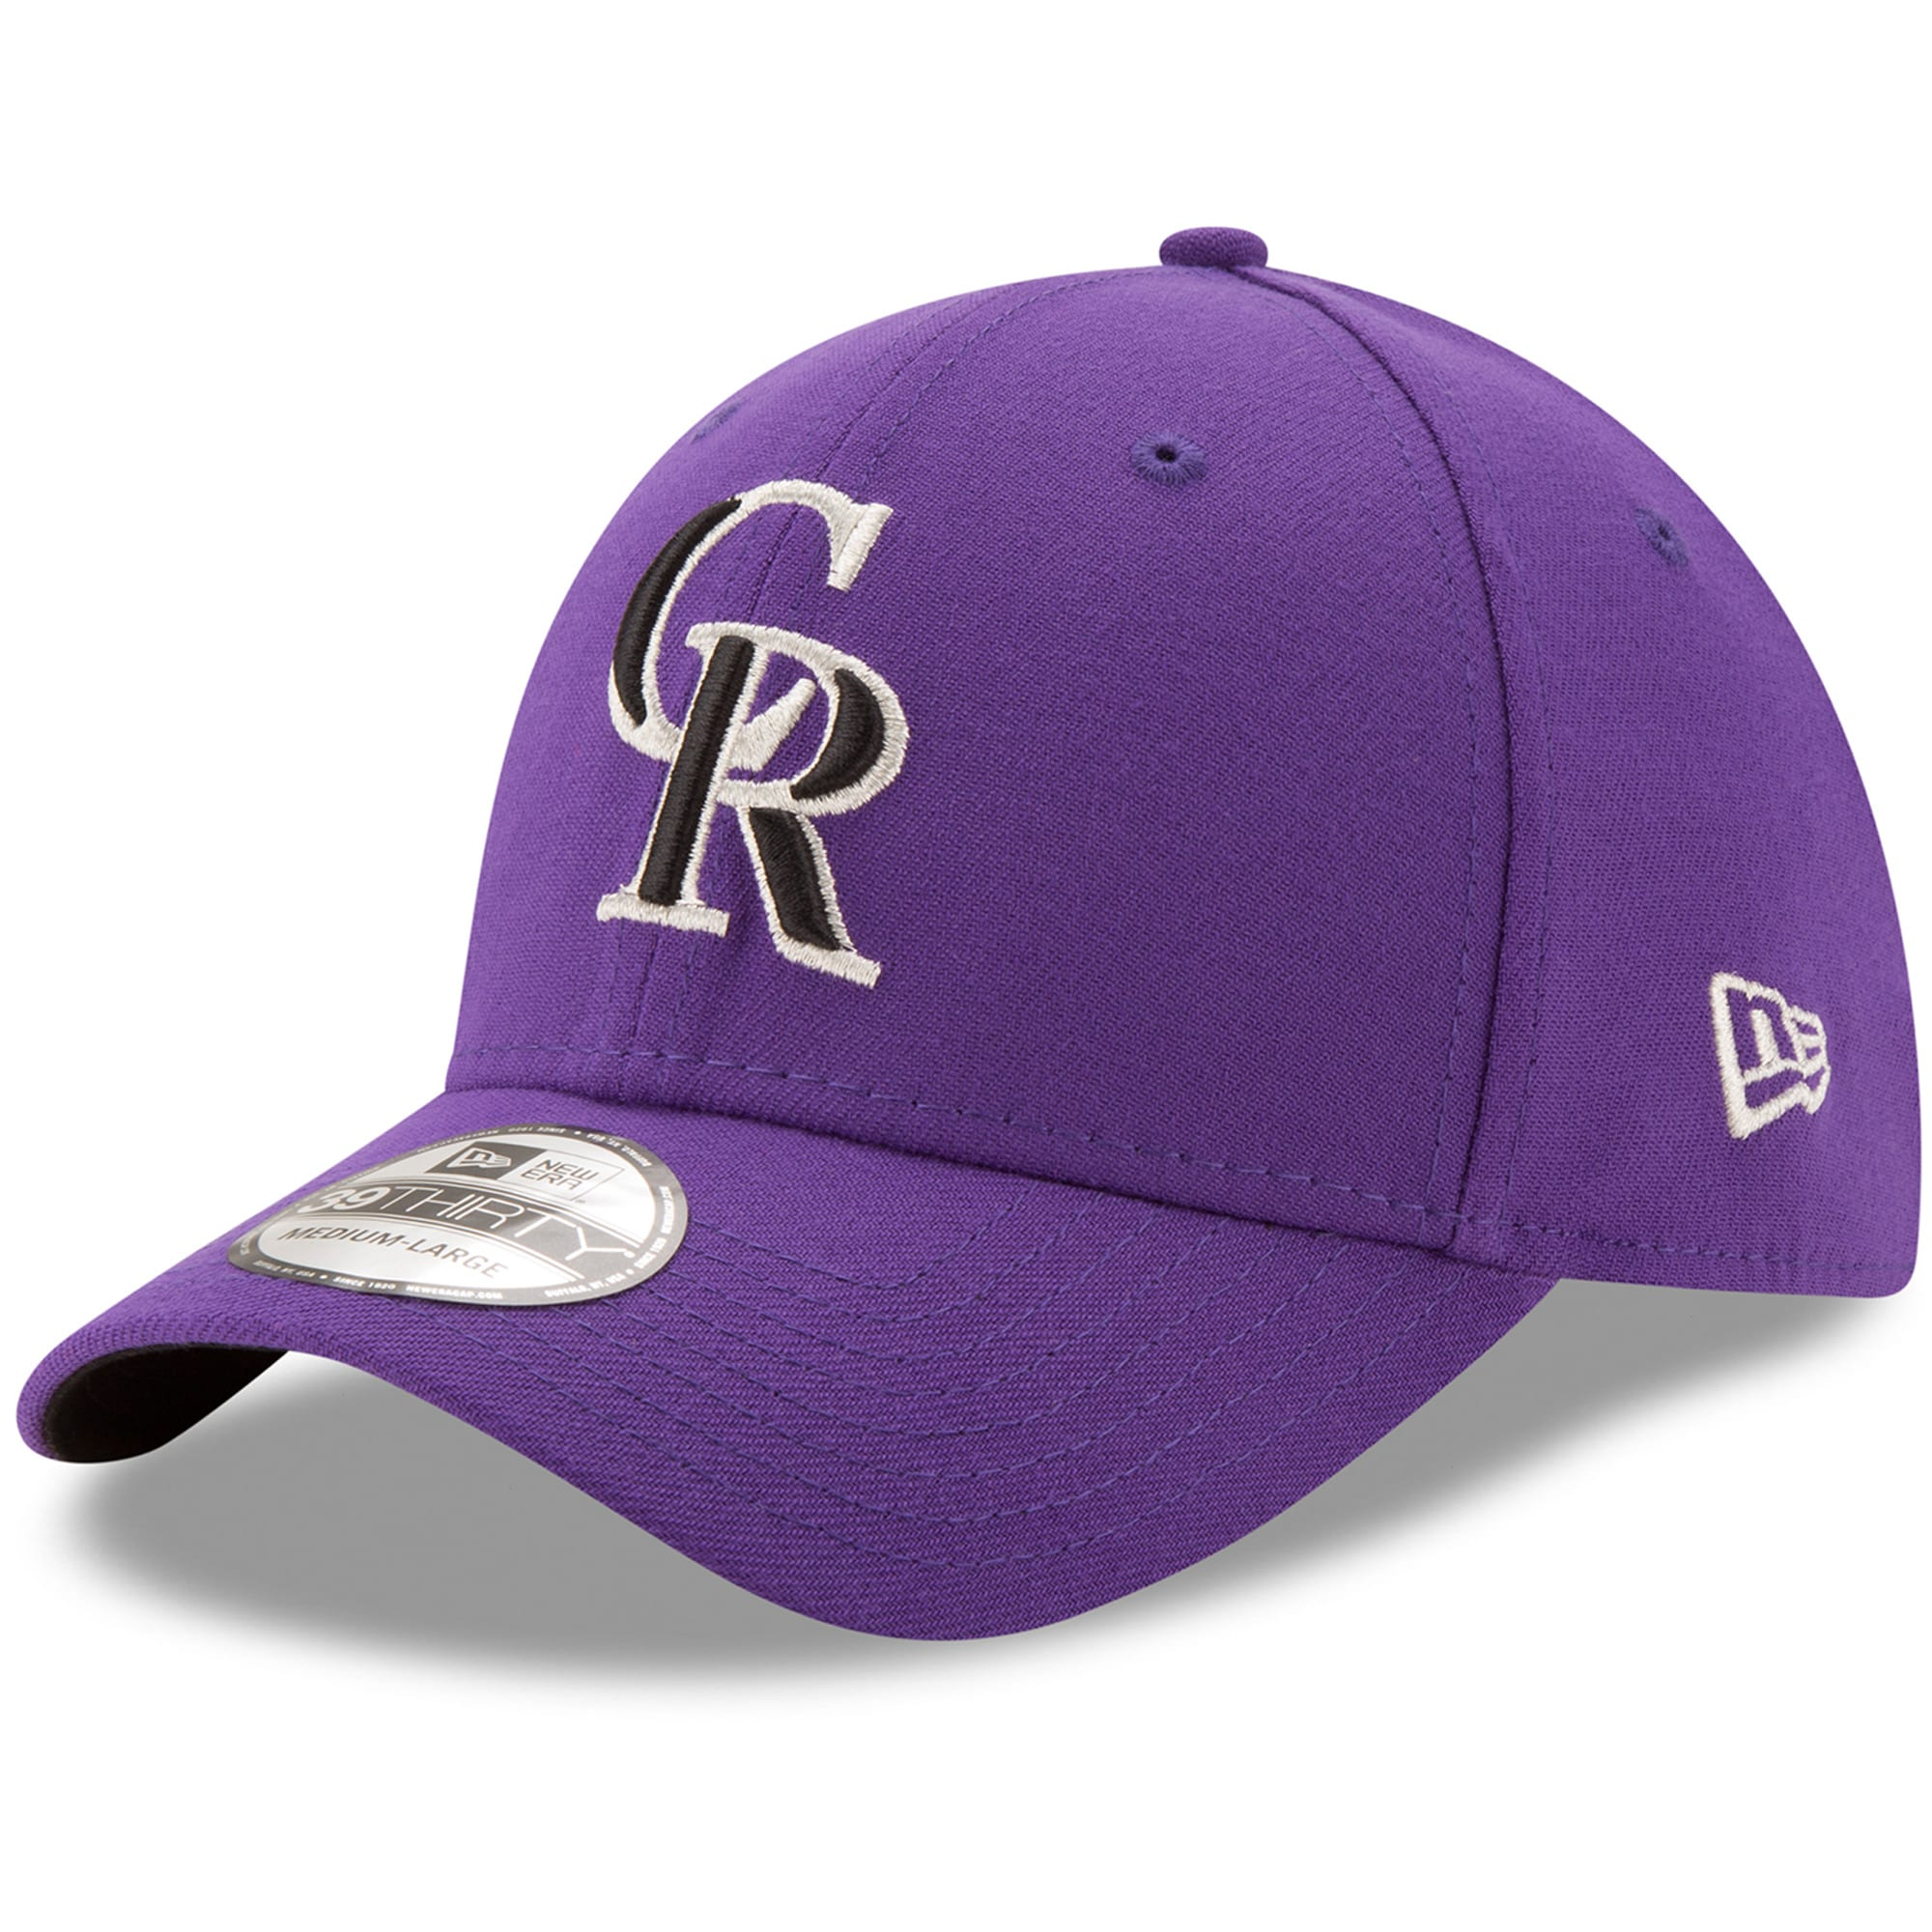 Colorado Rockies New Era Alternate 2 Team Classic 39THIRTY Flex Hat - Purple